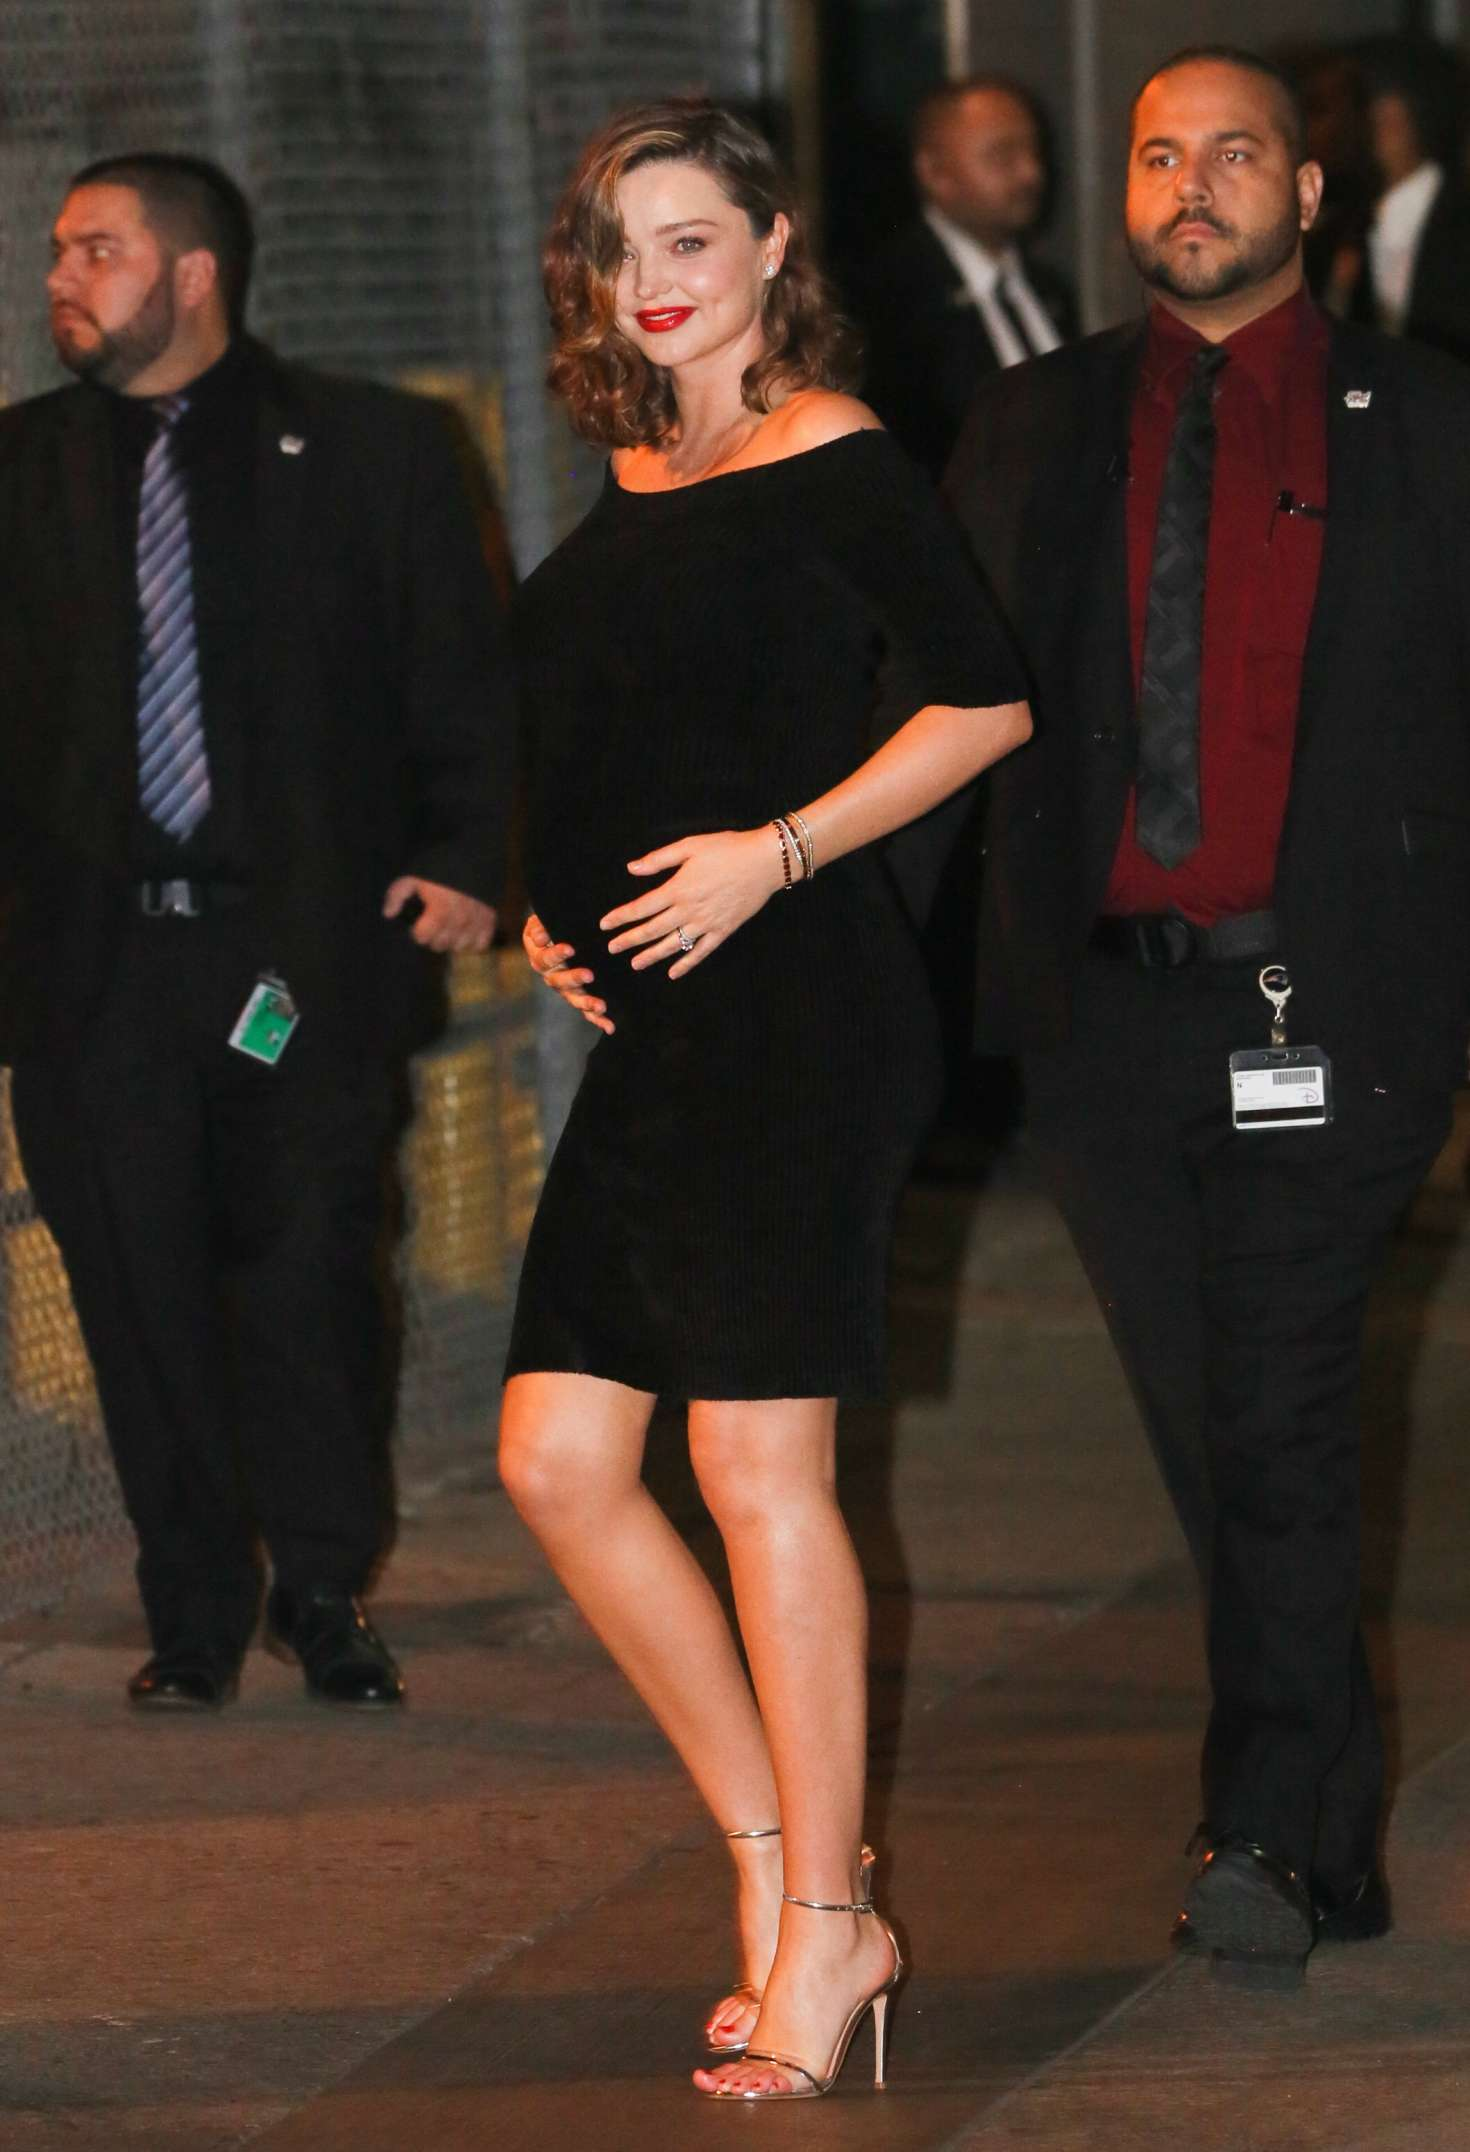 Miranda Kerr 2018 : Miranda Kerr: Leaves at Jimmy Kimmel Live -03